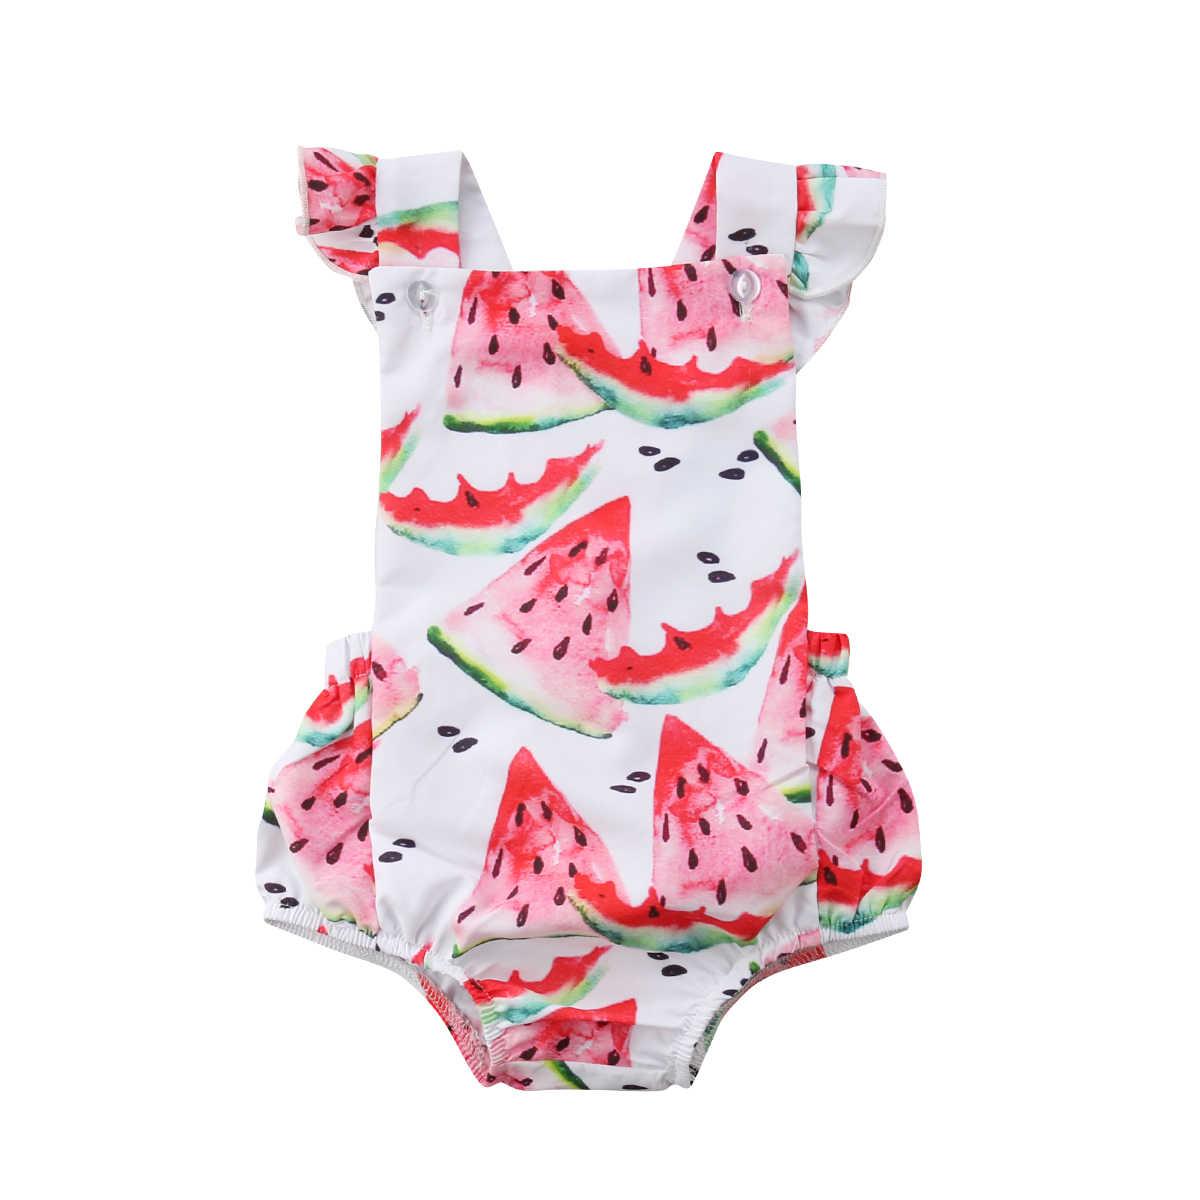 c0d20c6c97a8 Cute Fruit Newborn Baby Girls Toddler Rompers Summer Watermelon Print  Sleeveless Jumpsuit Playsuit Cotton Baby Girls